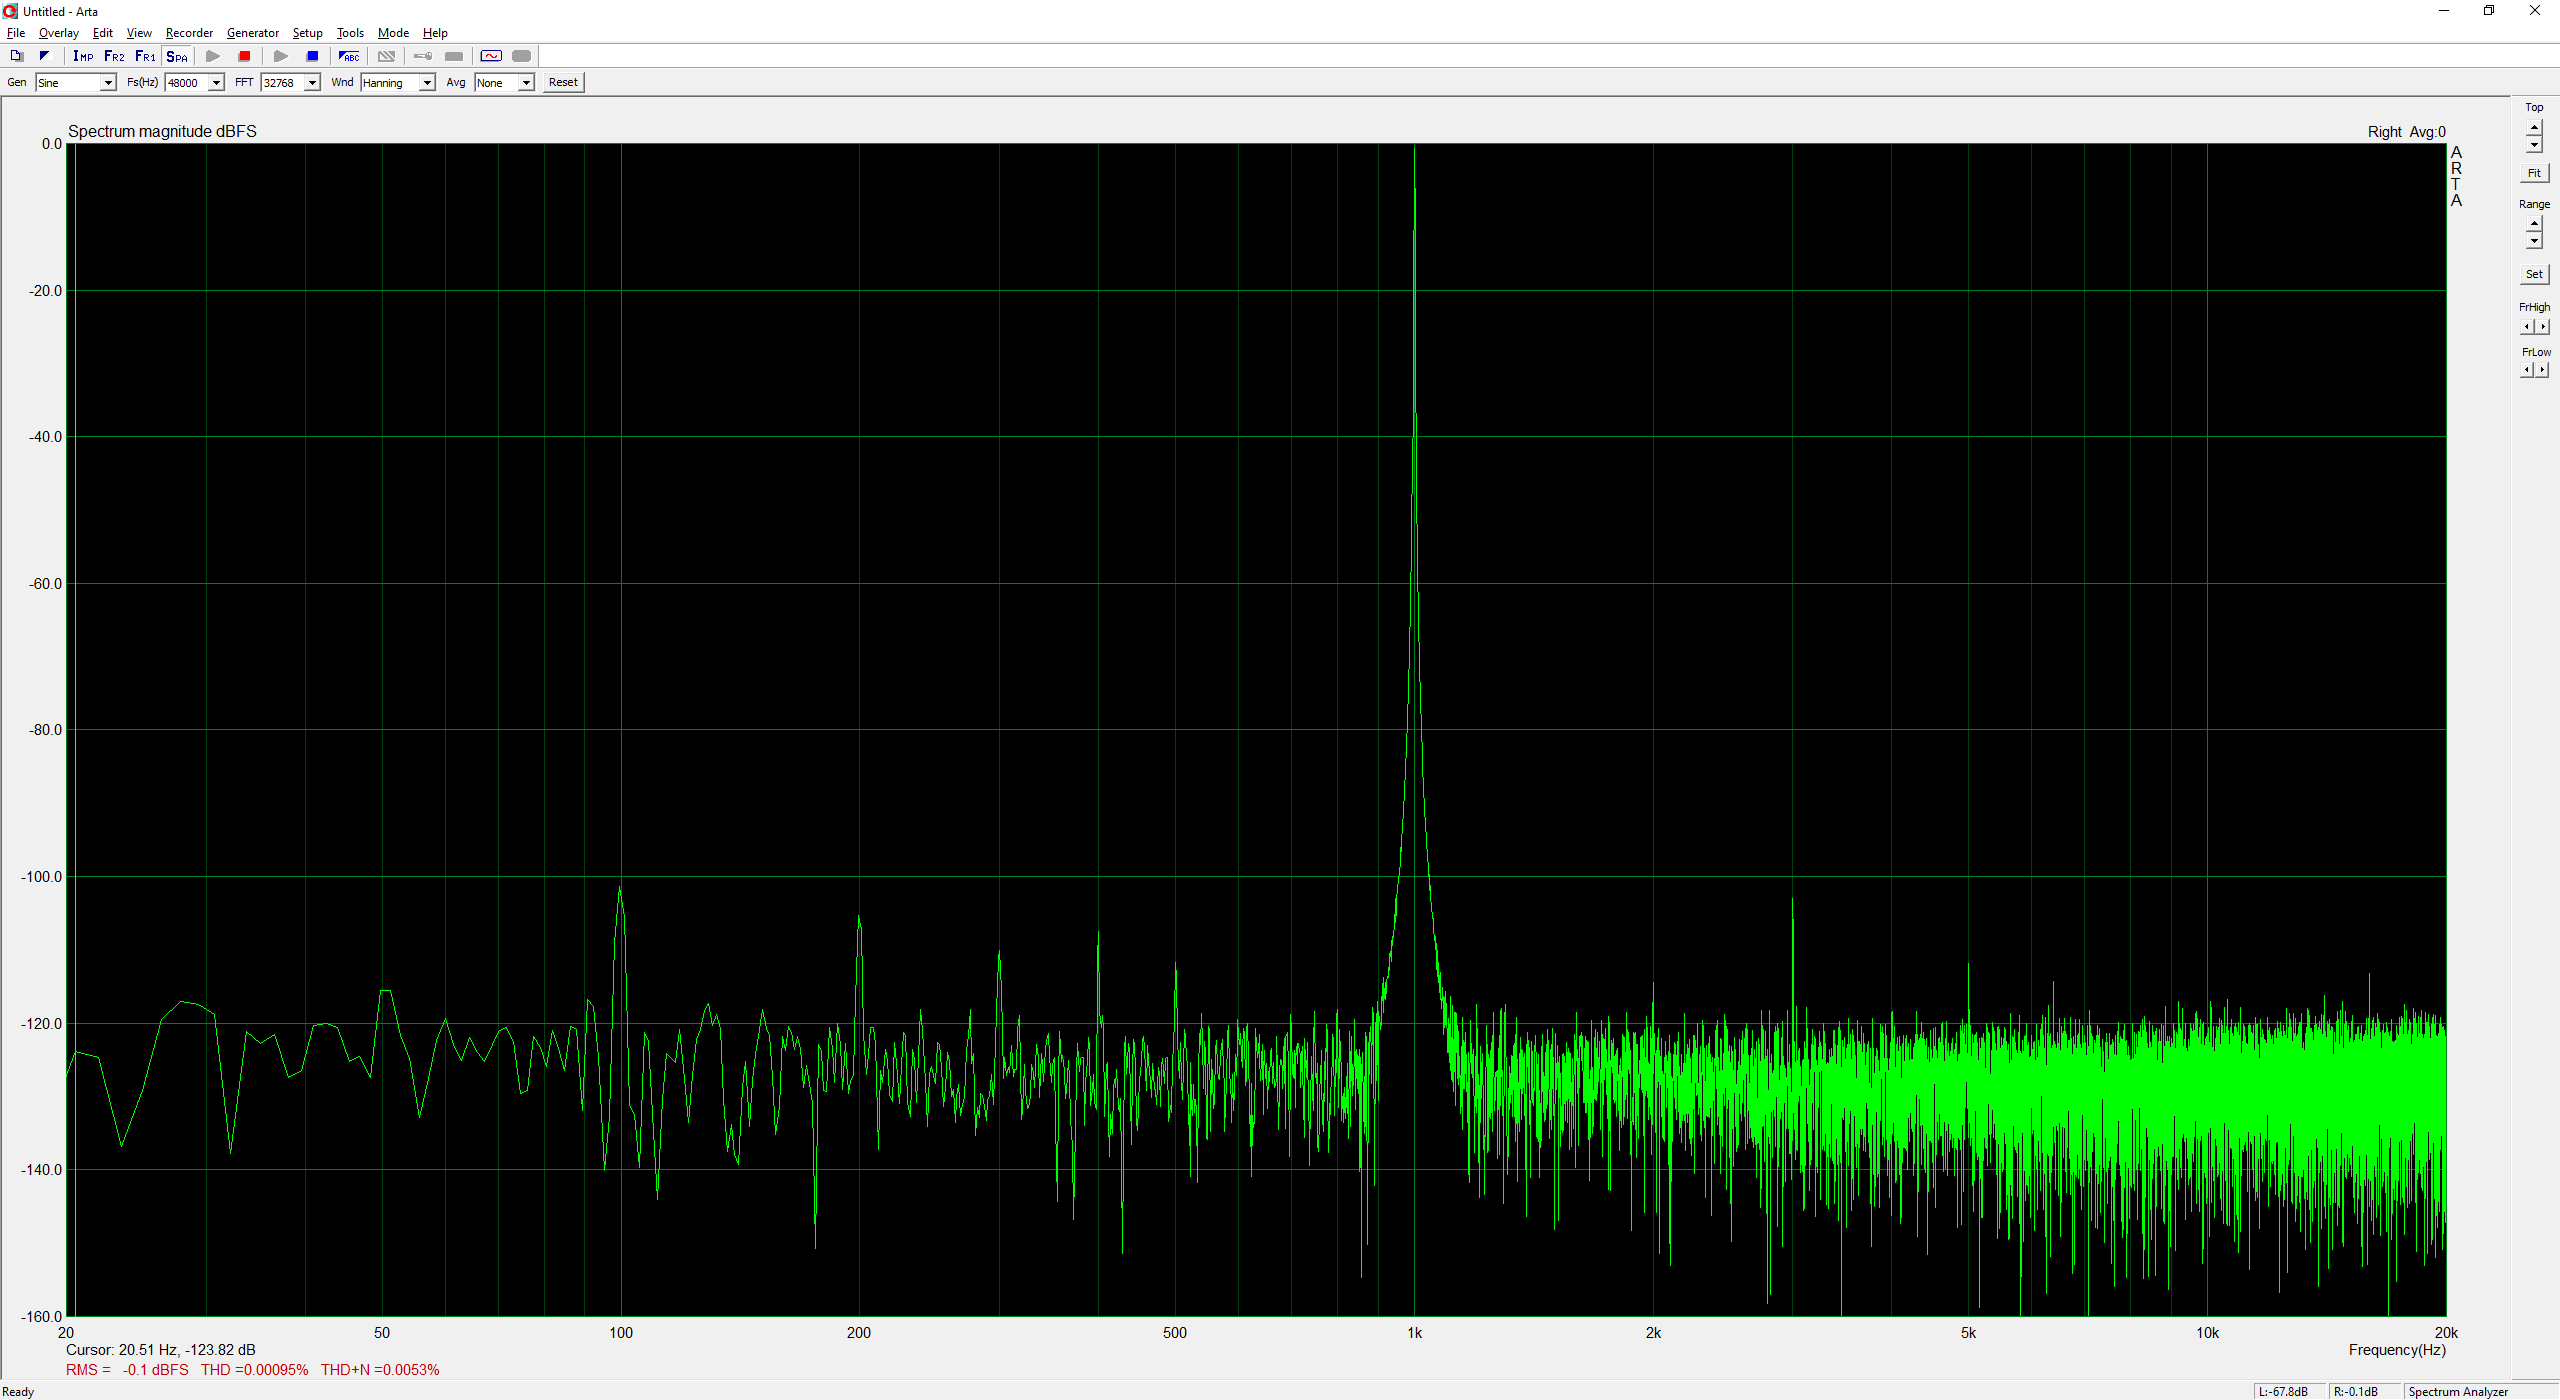 2V RMS - Burson_Soloist_3XP_HighGain.png